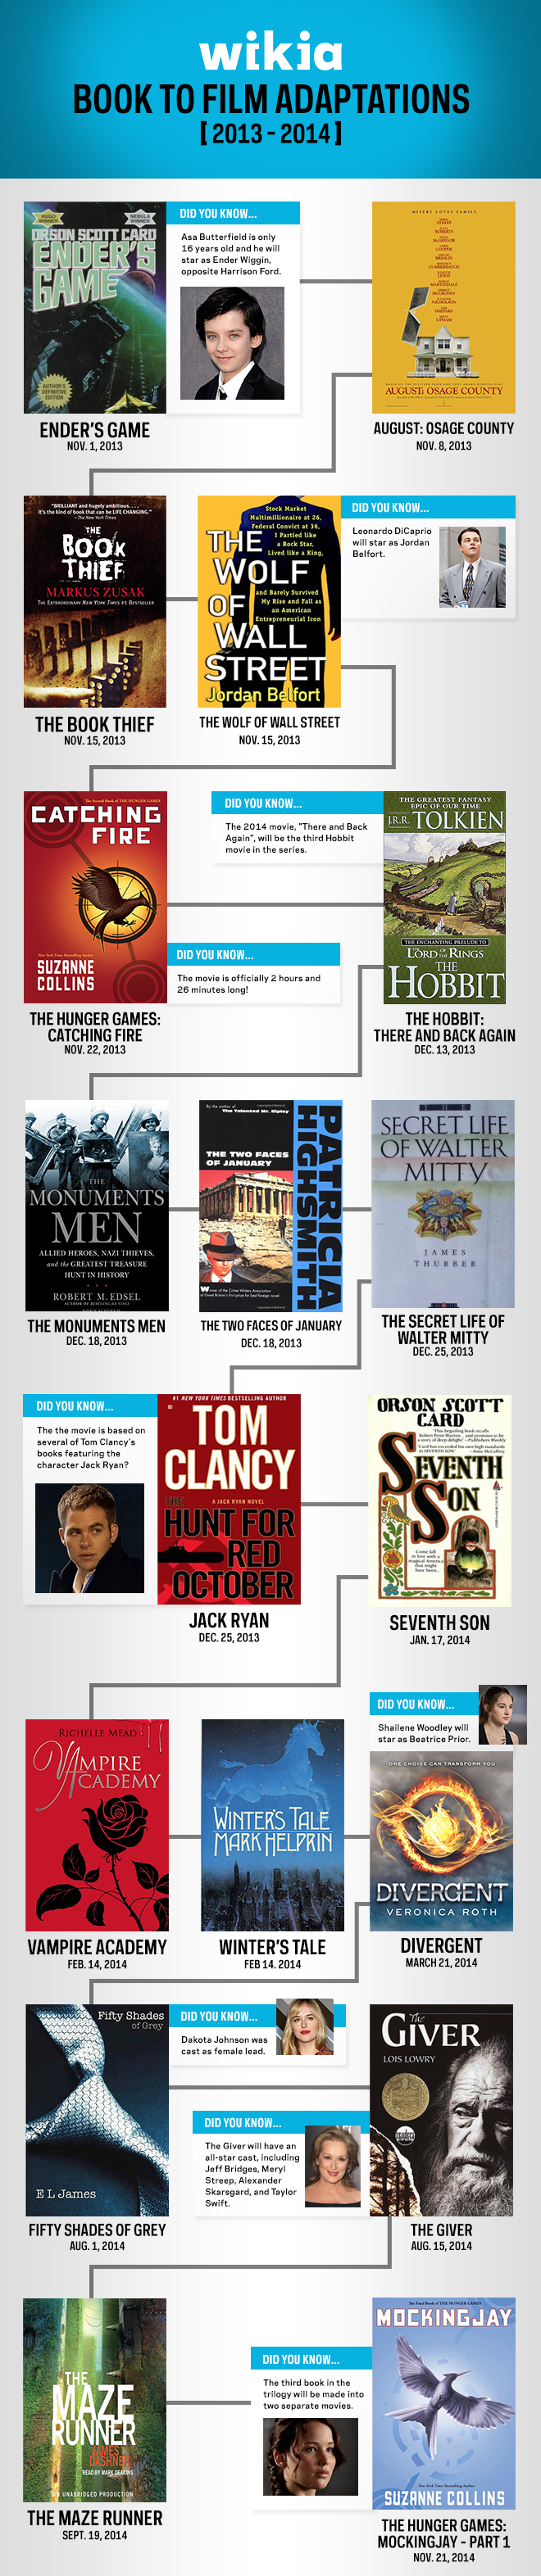 Wikia BookToFilm Chart